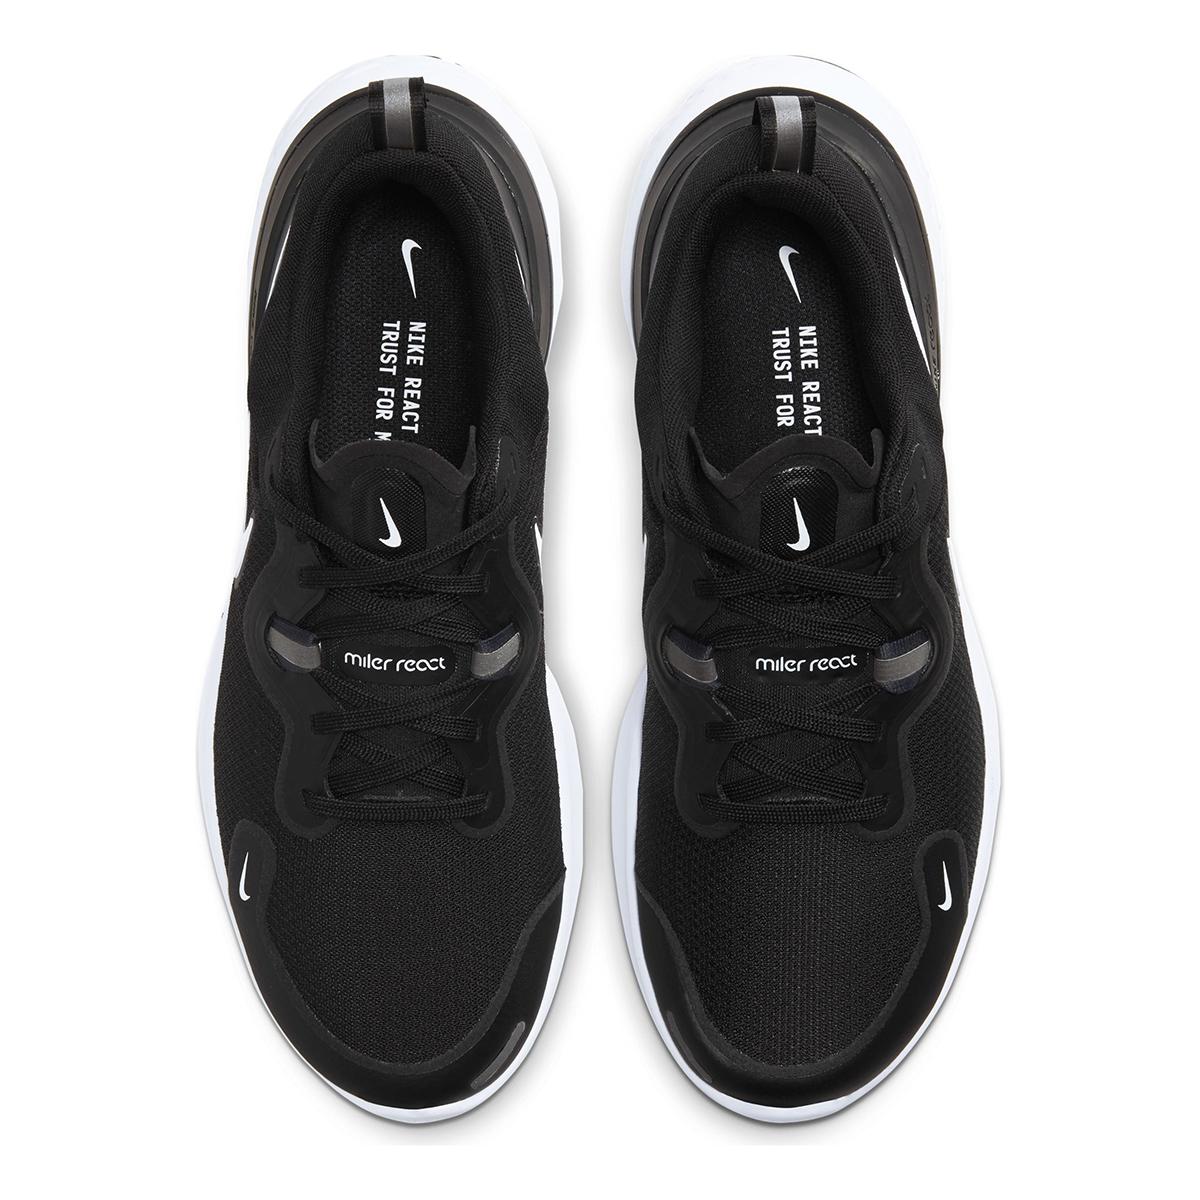 Men's Nike React Miler Running Shoe - Color: Black/Dark Grey/Anthracite/White (Regular Width) - Size: 6, Black/Dark Grey/Anthracite/White, large, image 5